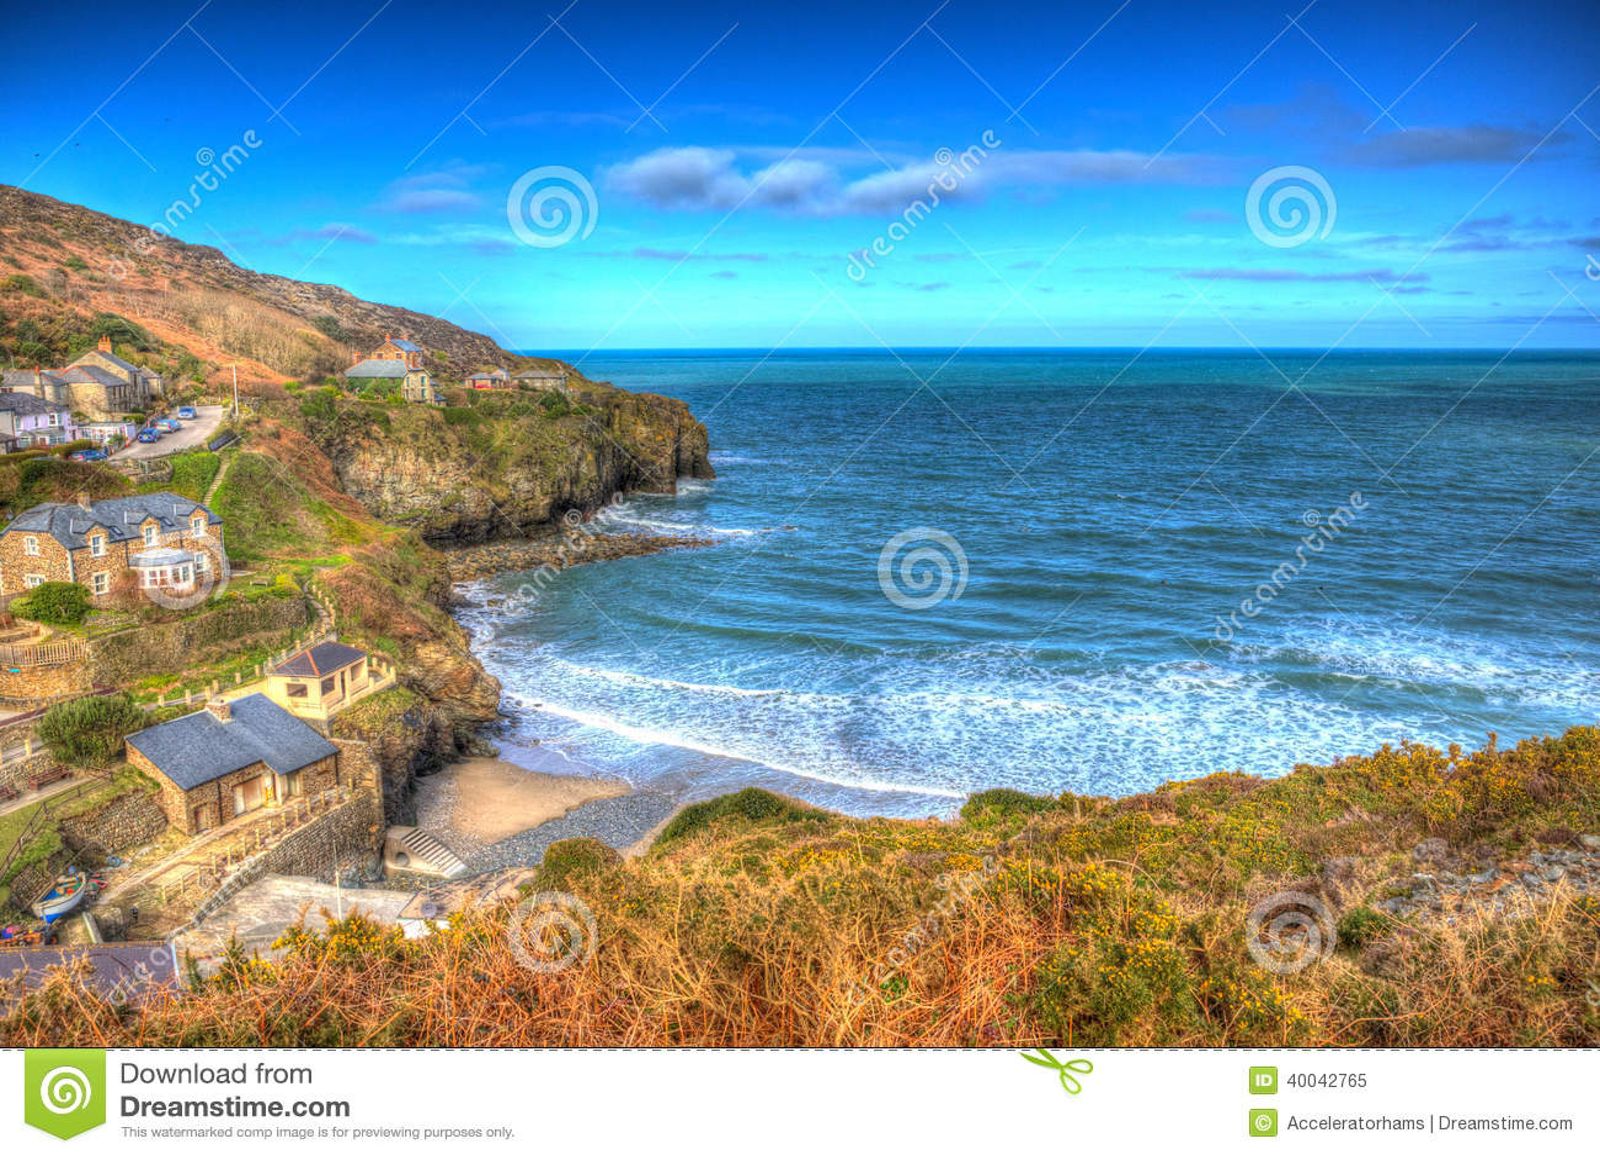 St. Agnes Cornwall England zwischen Newquay und St. Ives in buntem HDR